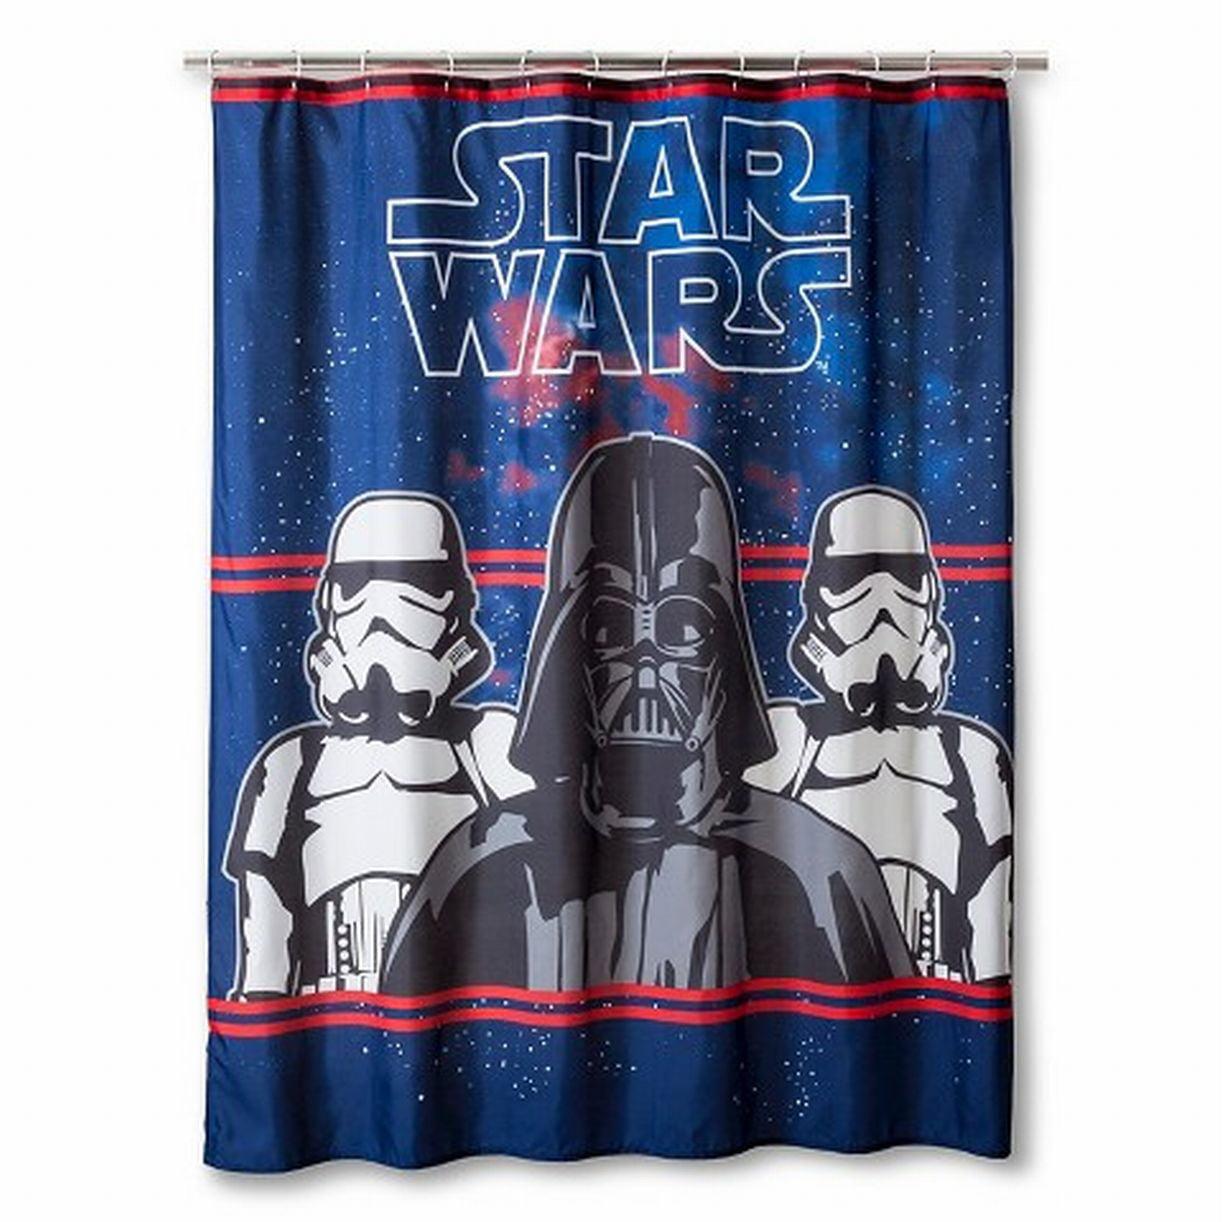 Disney Star Wars Darth Vader Fabric Shower Curtain Kids Bath Decor by